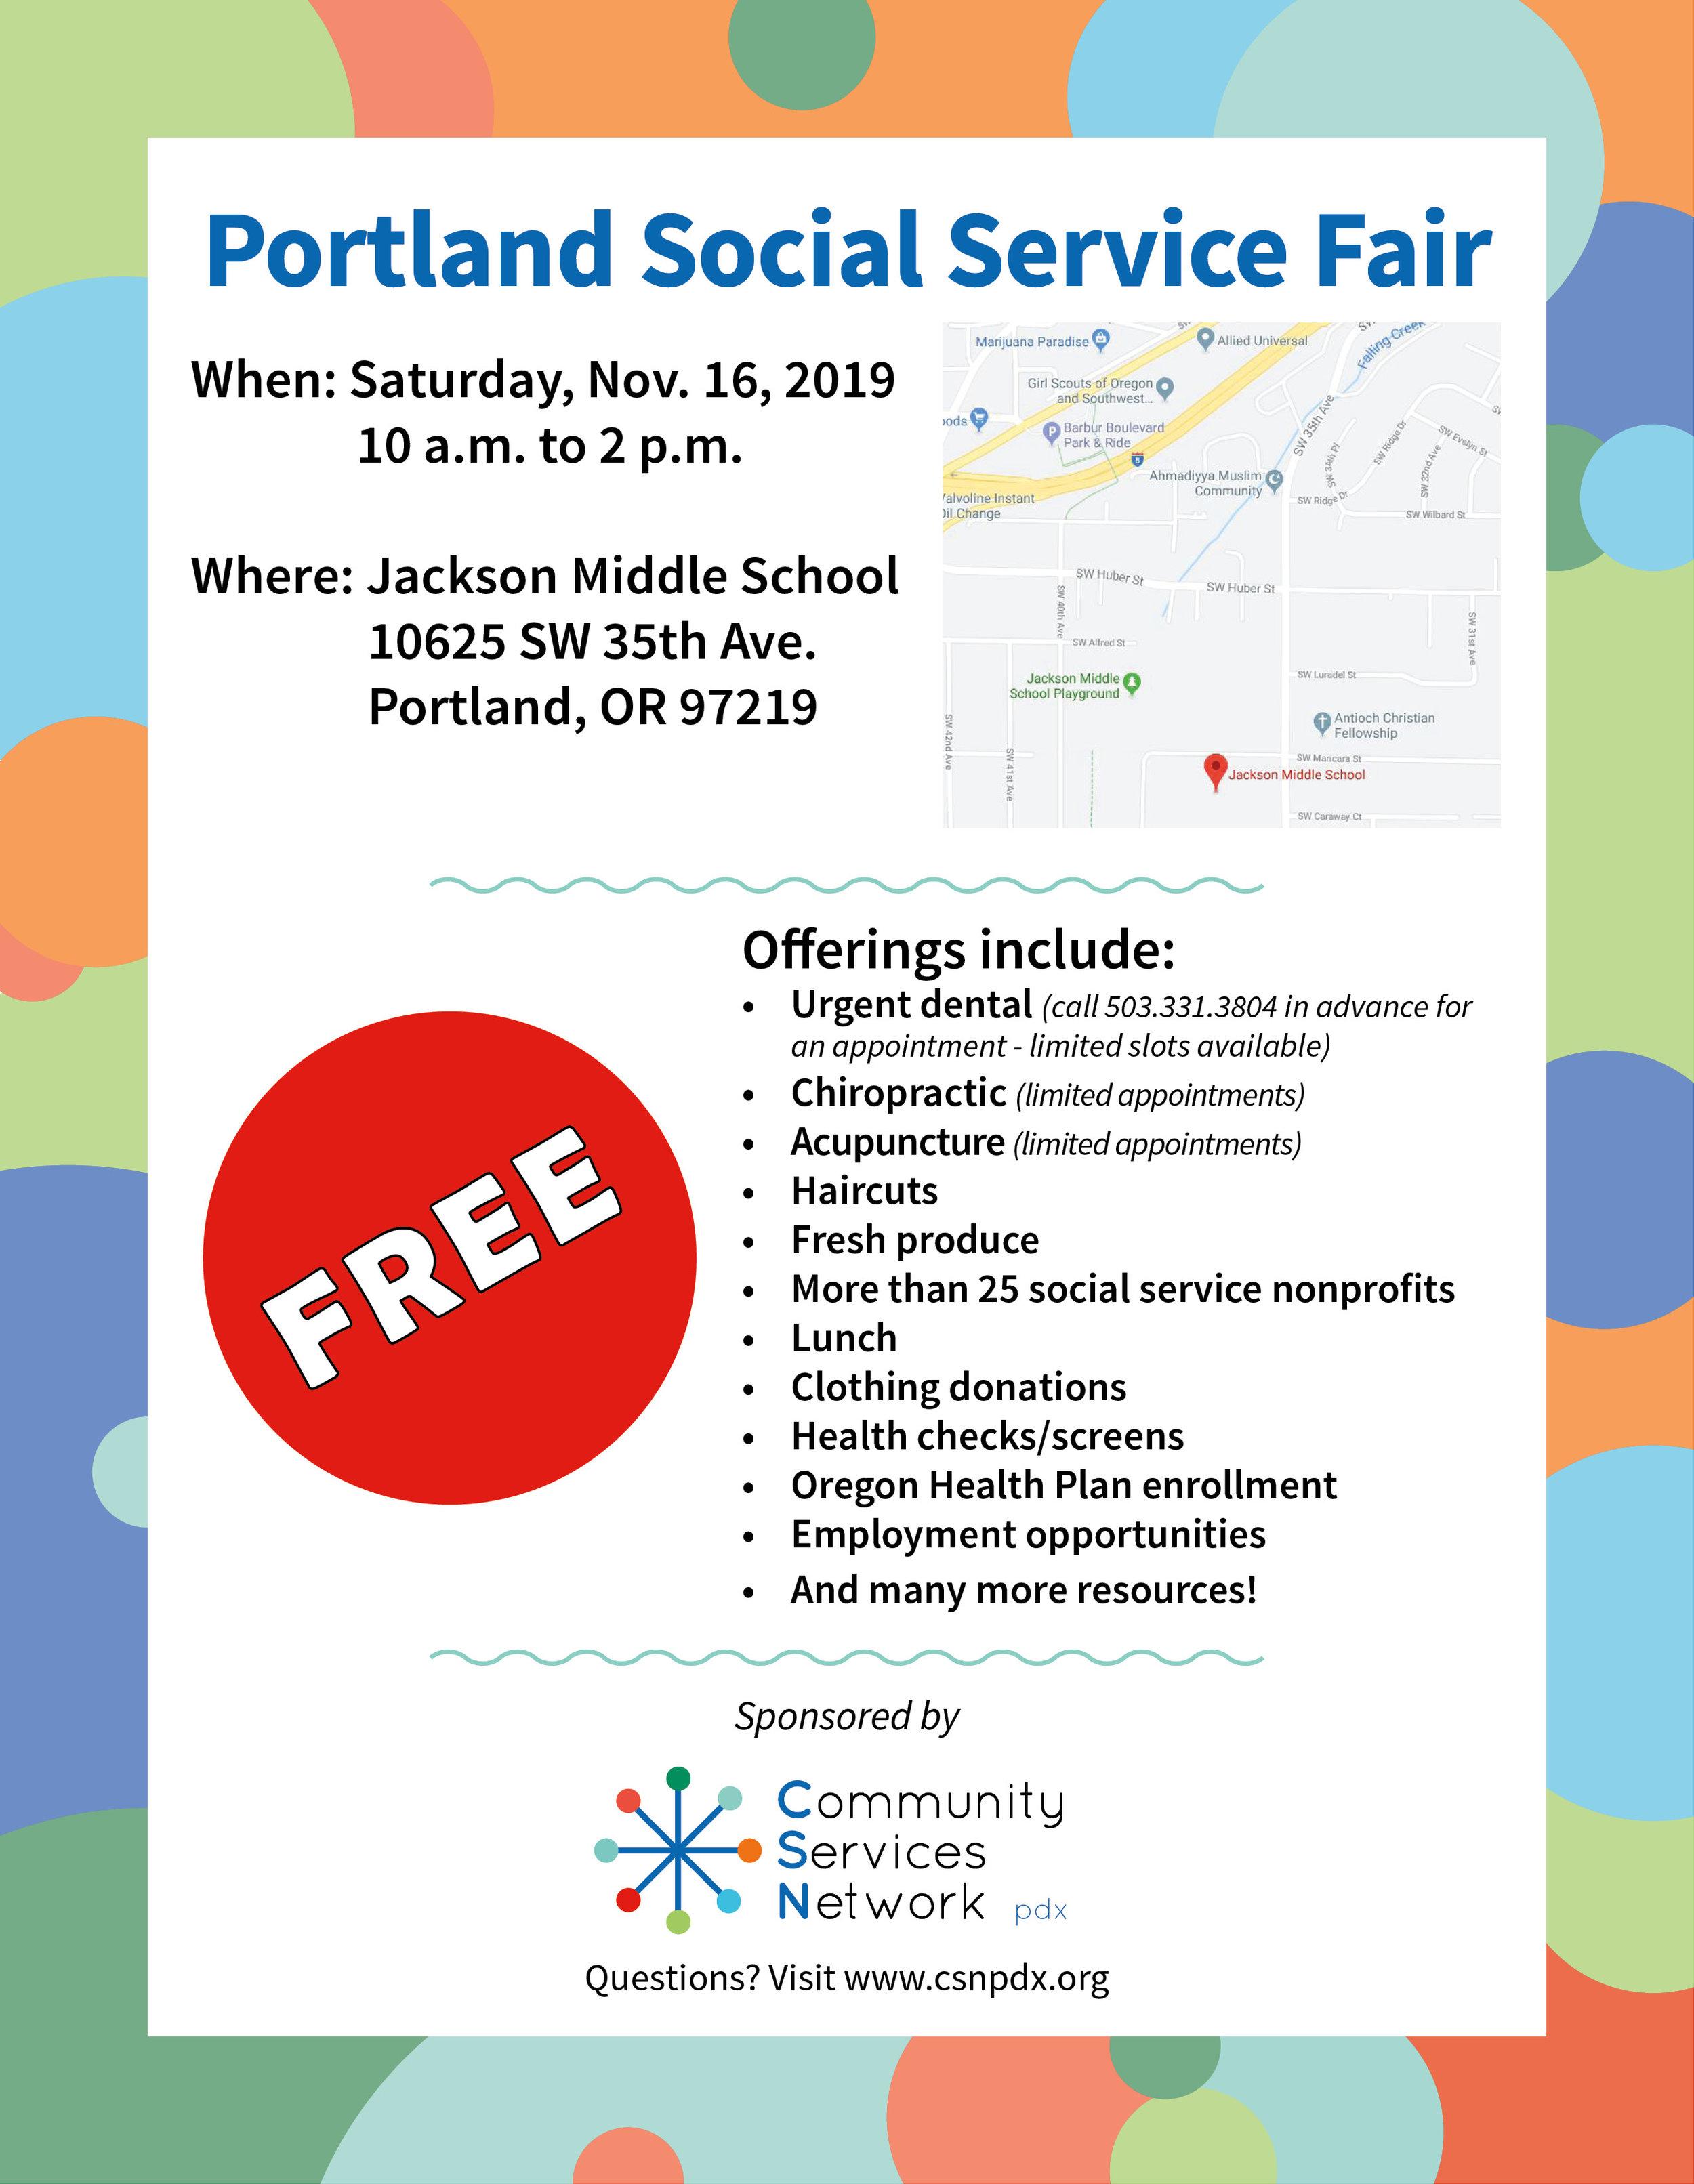 Social Service Fair #5 Flyer - 8.5x11 - November 16, 2019 - print.jpg